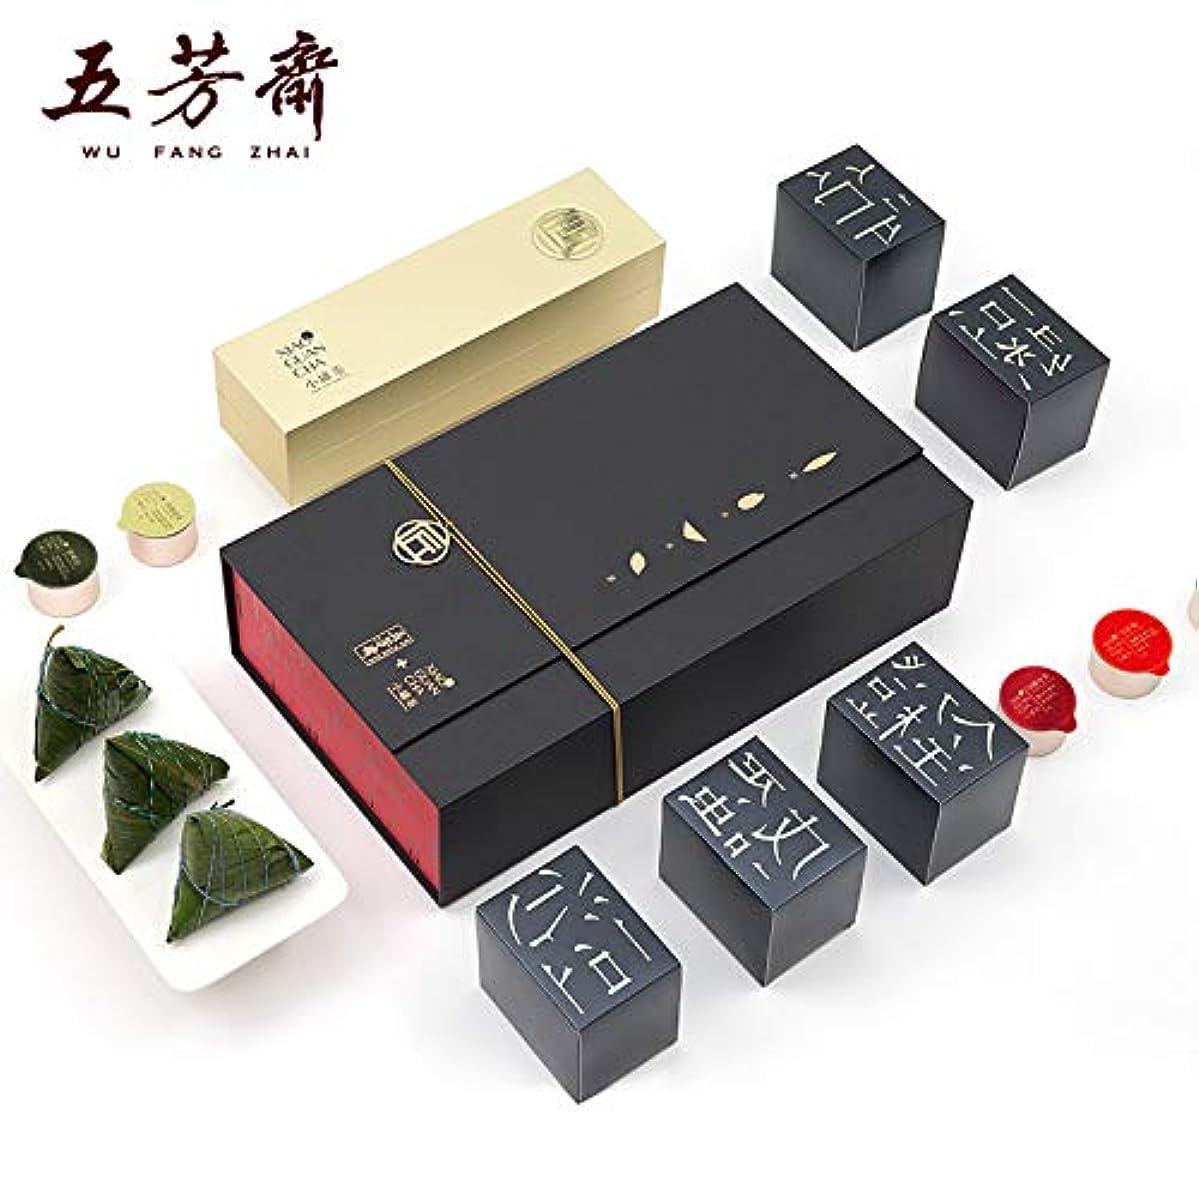 Wufangzhai x small pot tea big red robe Jasmine Tieguanyin frozen top oolong tea dumplings Dragon Boat Festival gift